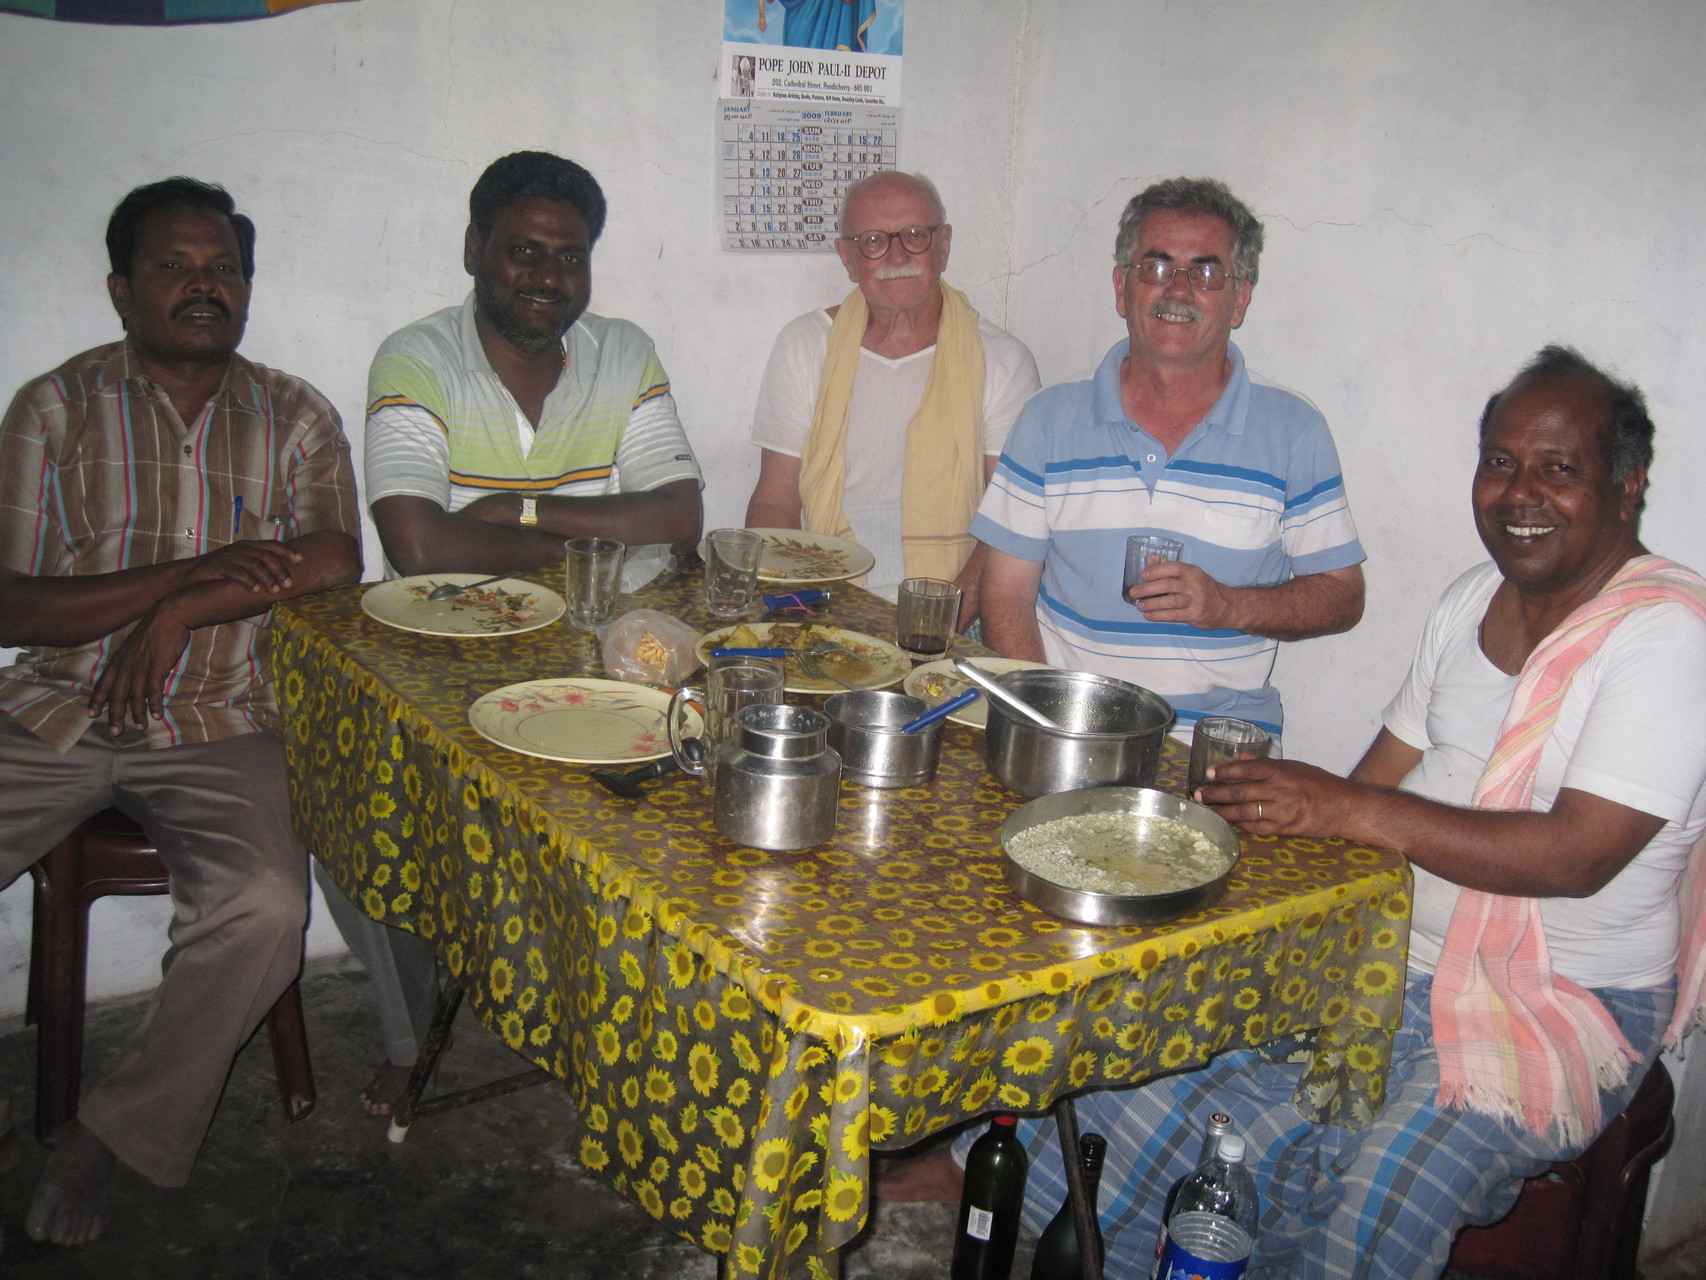 Dîner à la fraternité d'Alampoondi - Jagadisen, Rosario, Shanti, Anand, Visu  - Janvier 2009